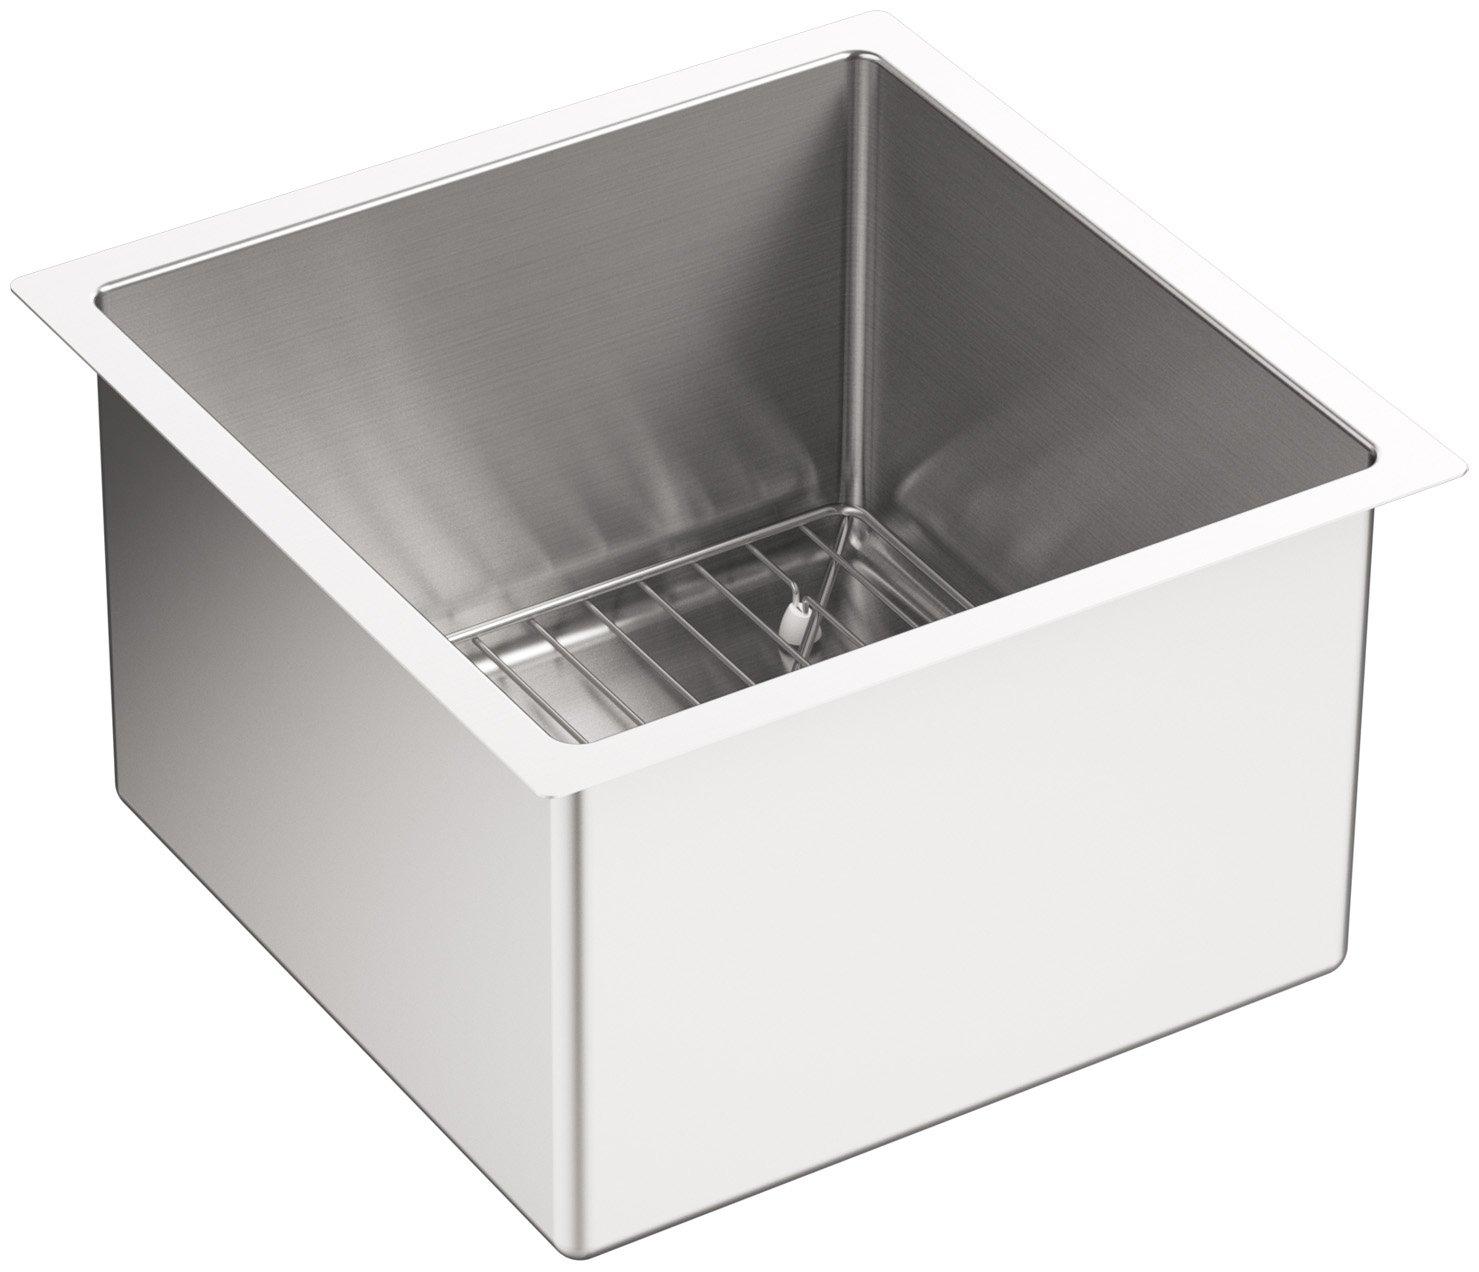 kohler kna strive  x inch undermount bar sink with  - kohler kna strive  x inch undermount bar sink with basin rackstainless steel pack   amazoncom